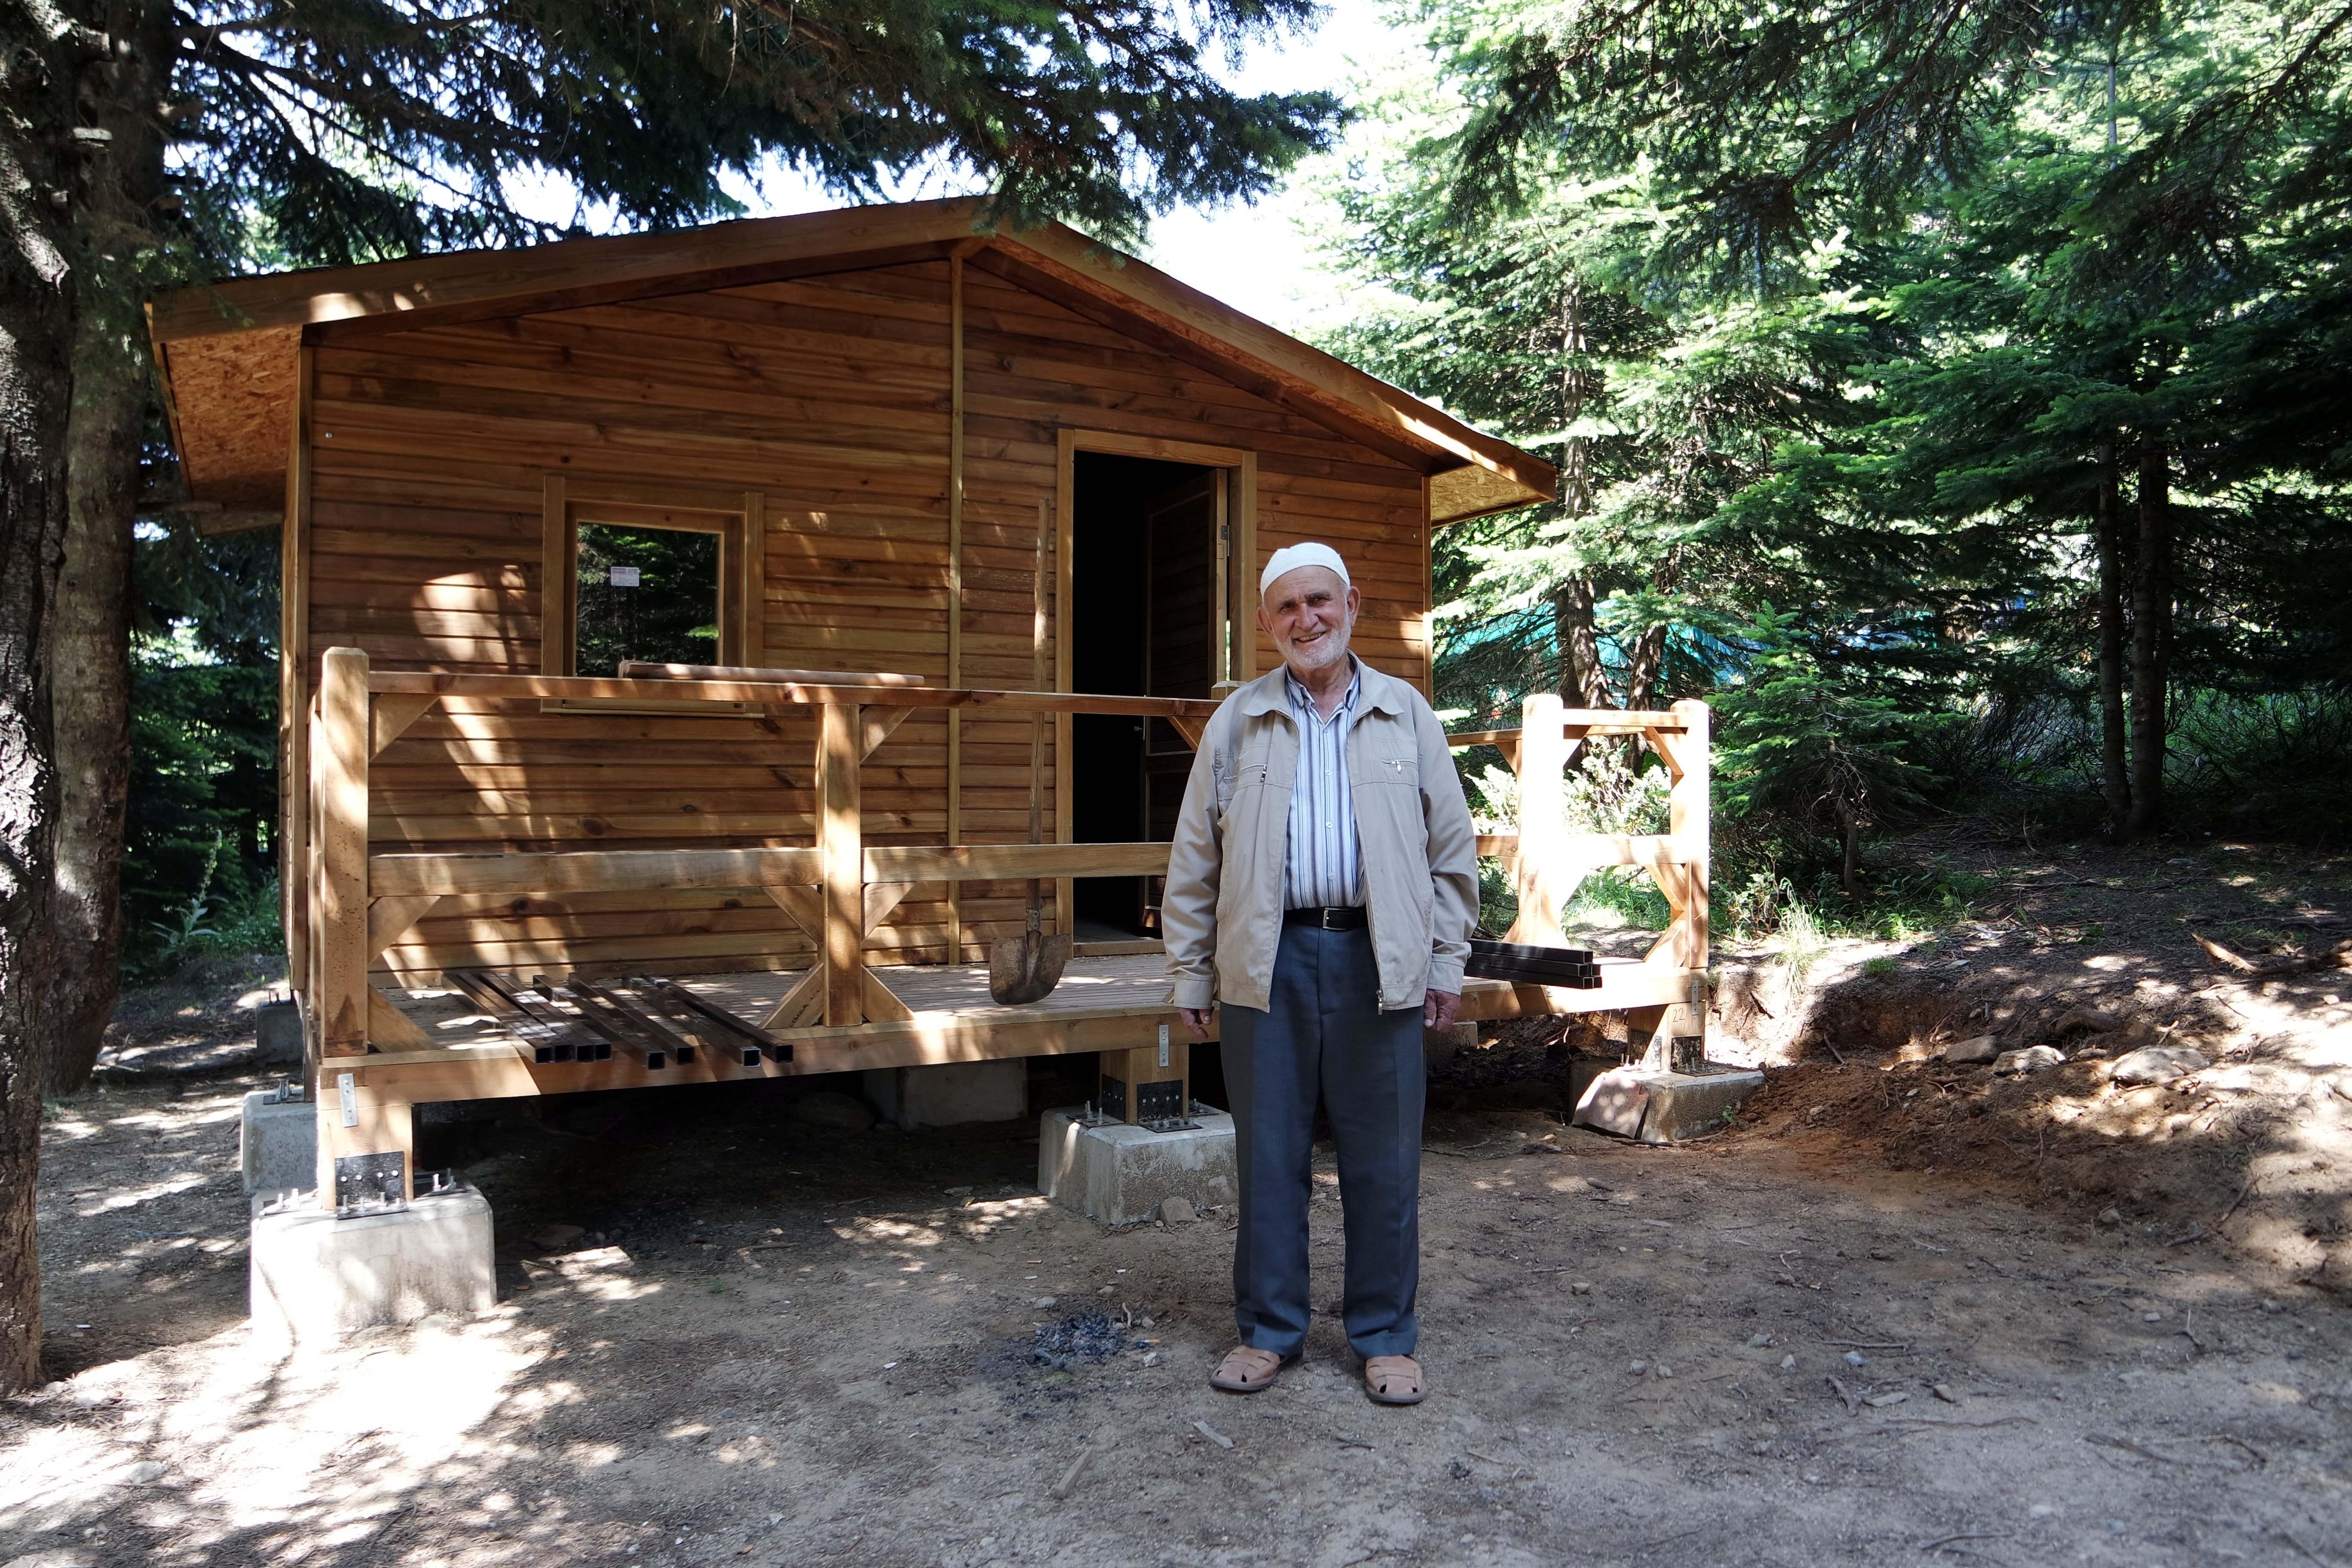 Malatya Agizdan Sivi Tedavisi Haftasi Son Dakika